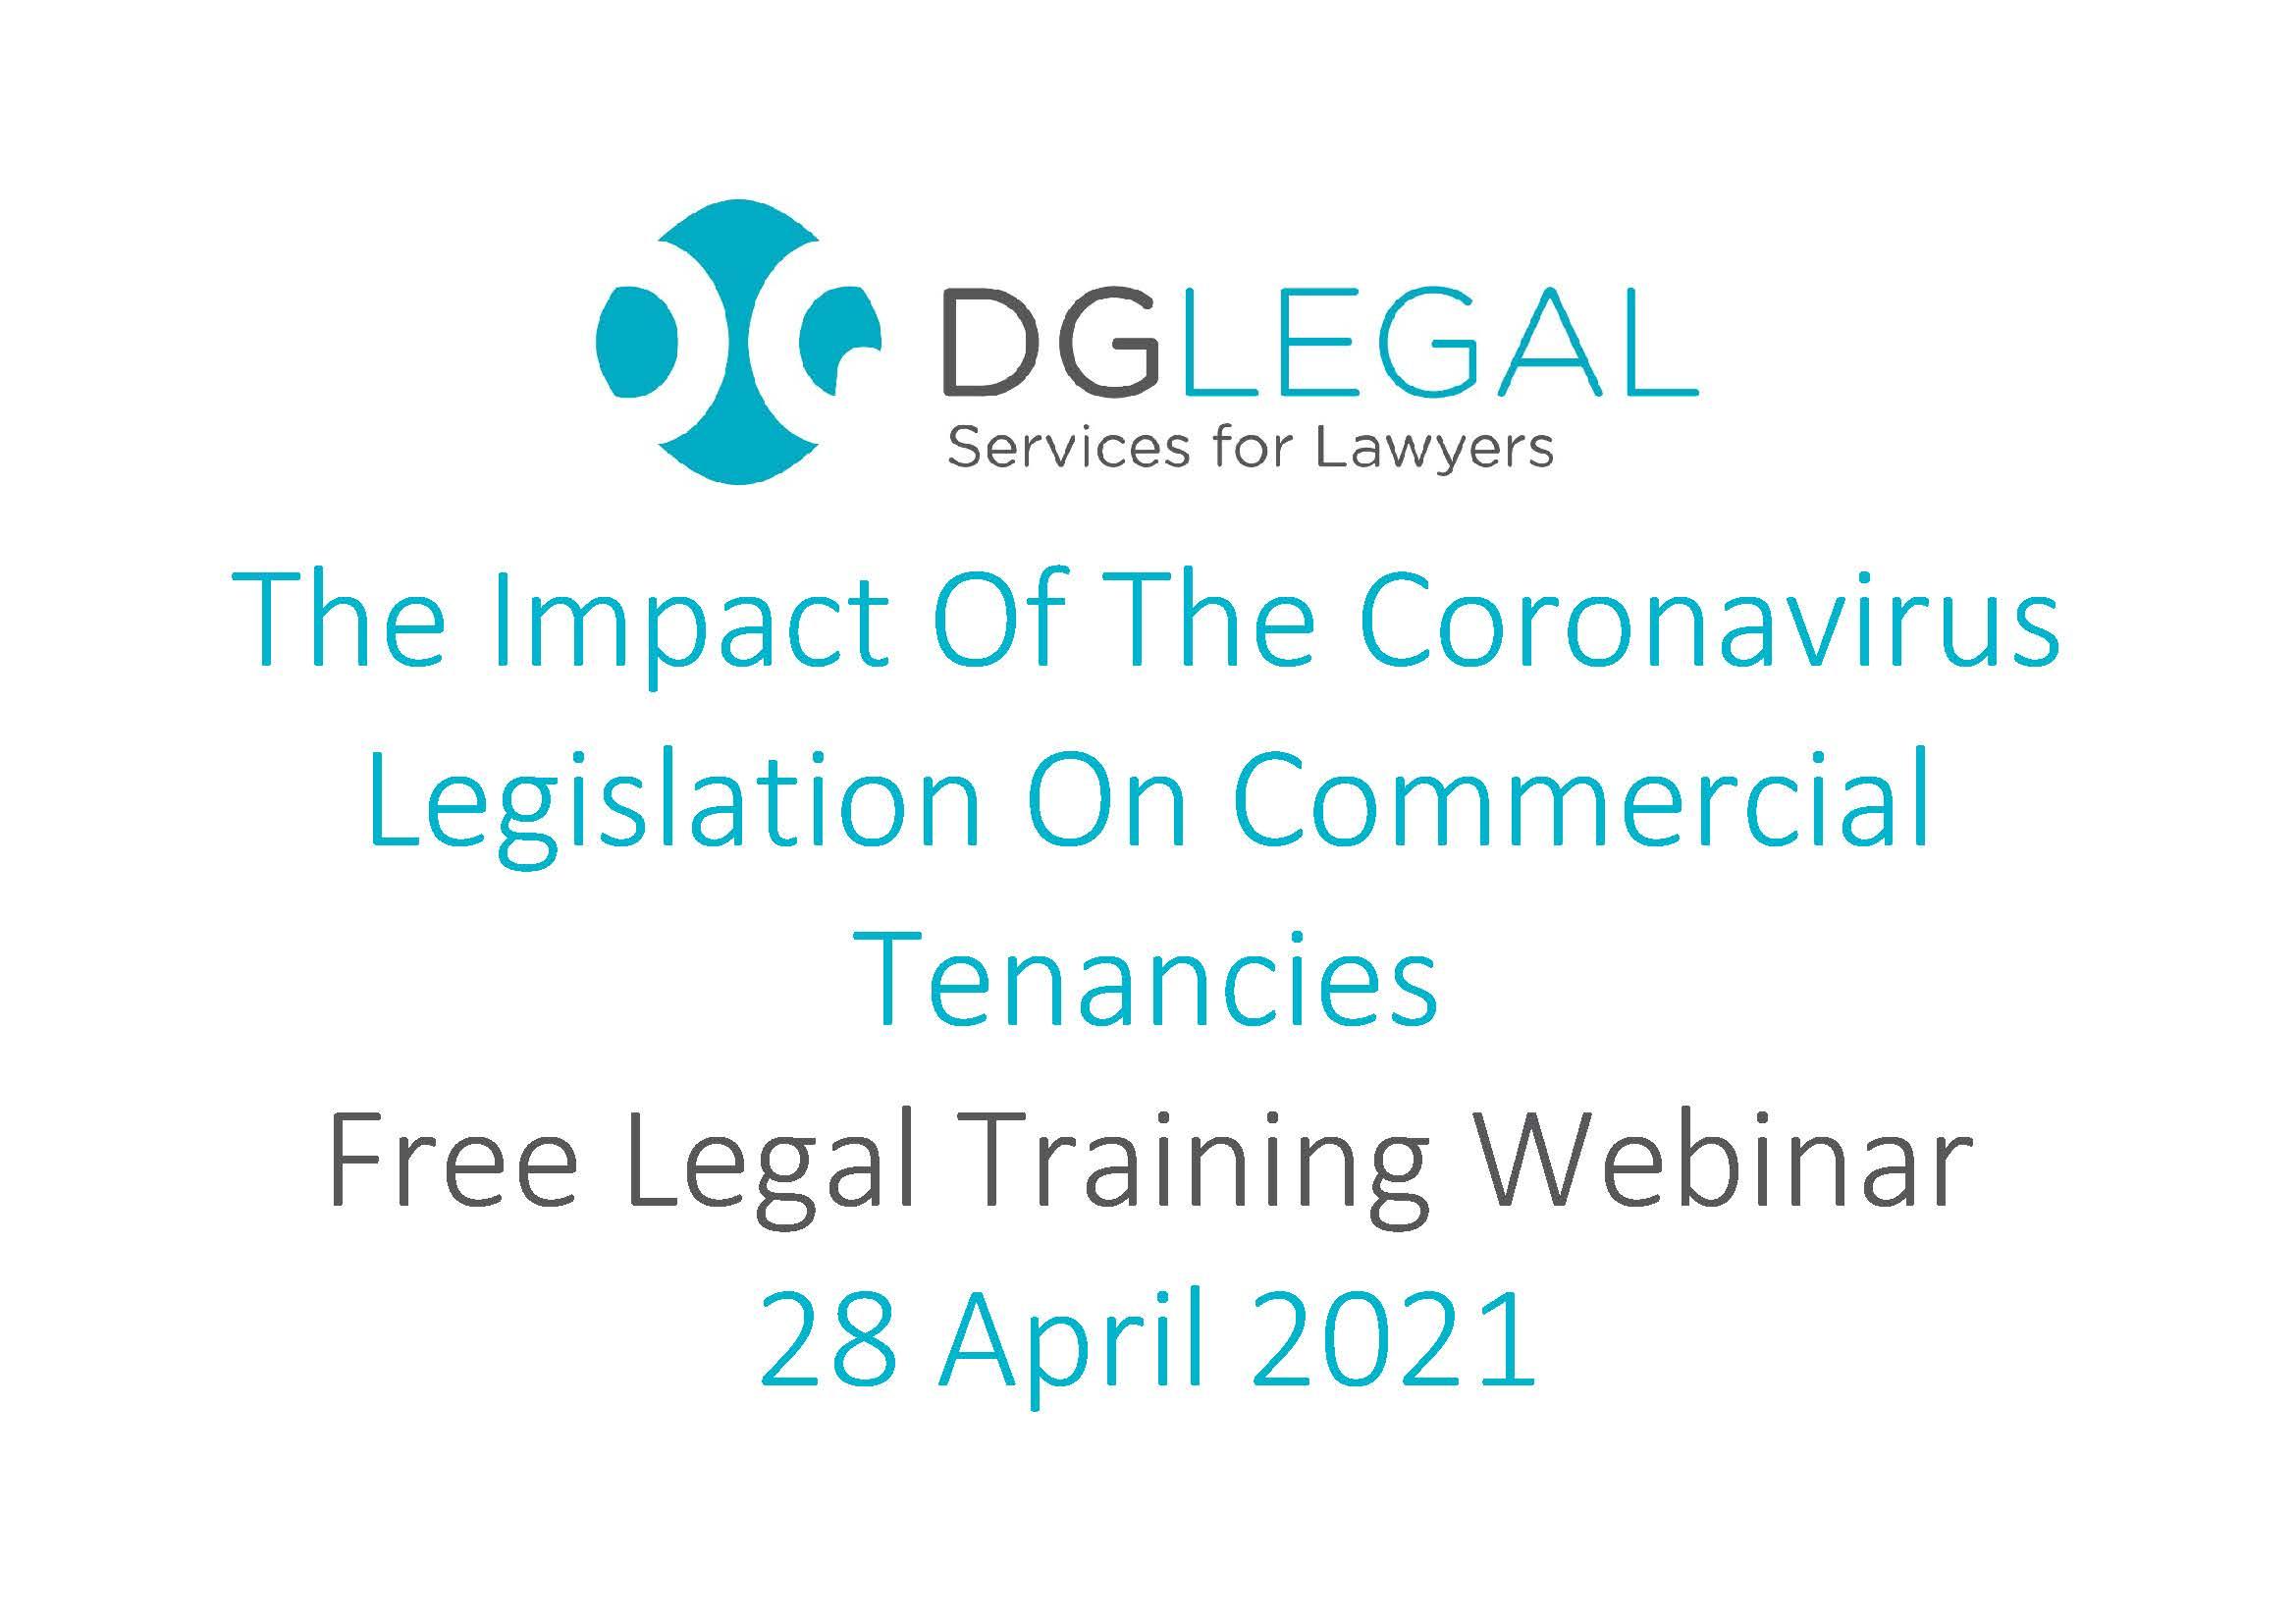 The Impact Of The Coronavirus Legislation On Commercial Tenancies